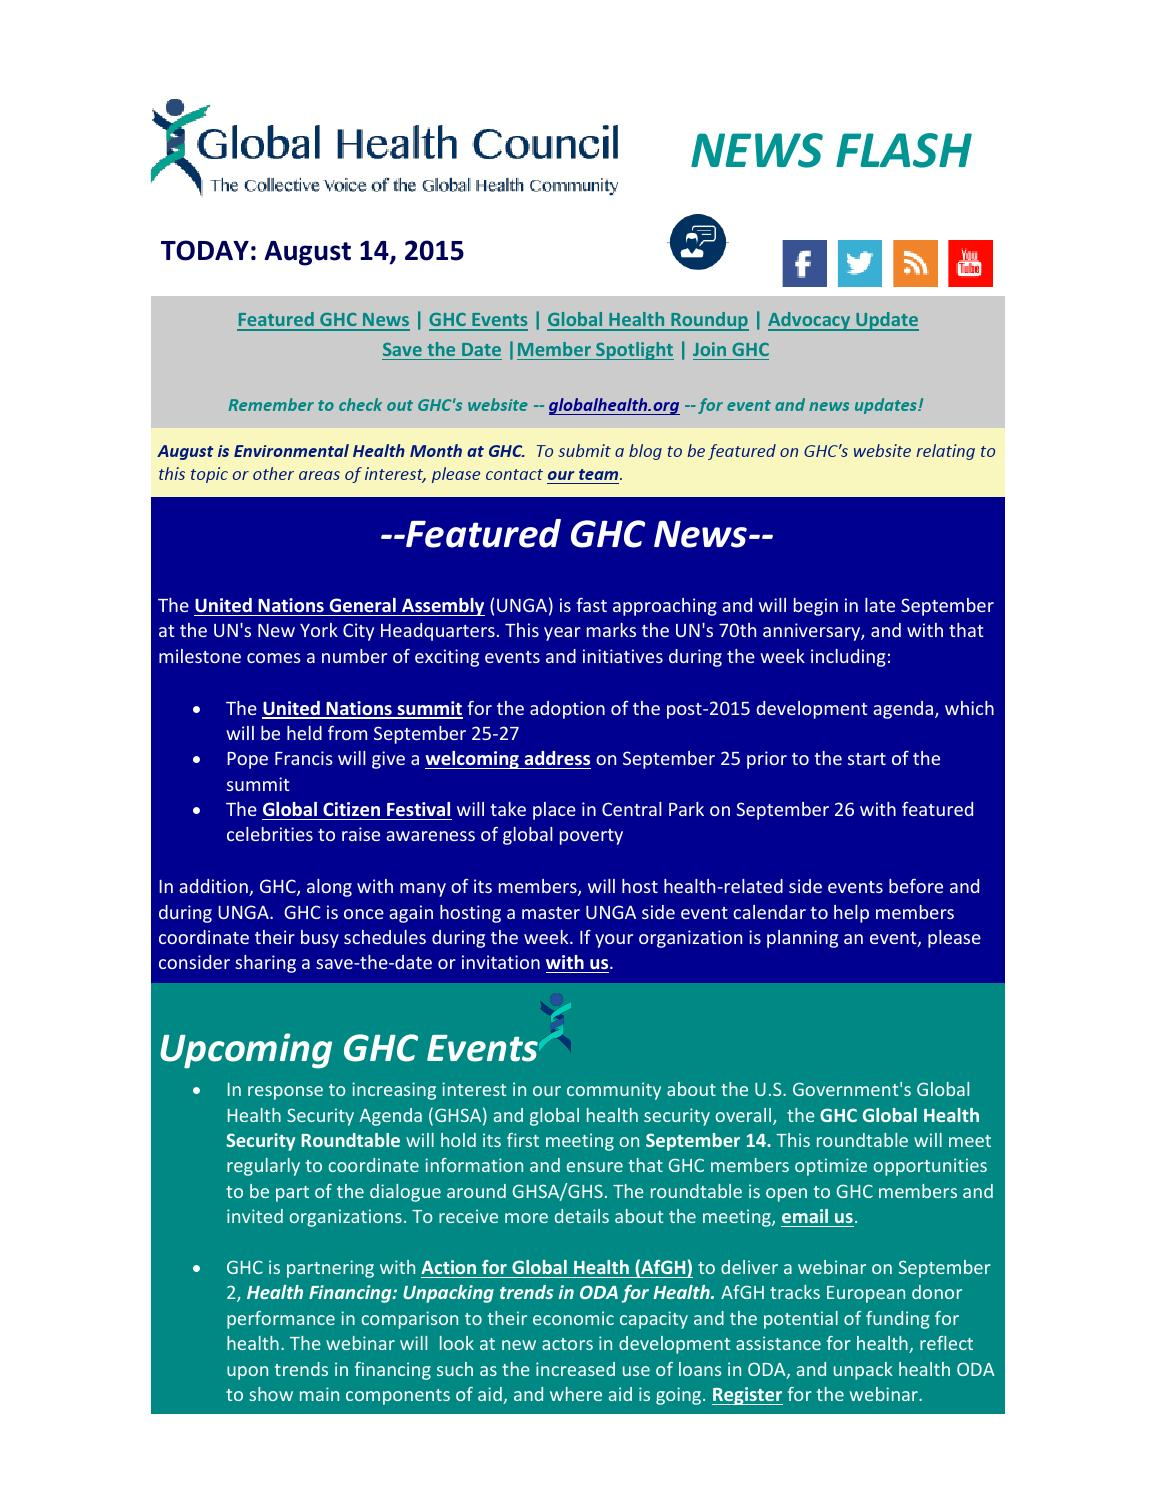 GHC NEWS FLASH Aug  14, 2015 by Global Health Council - issuu